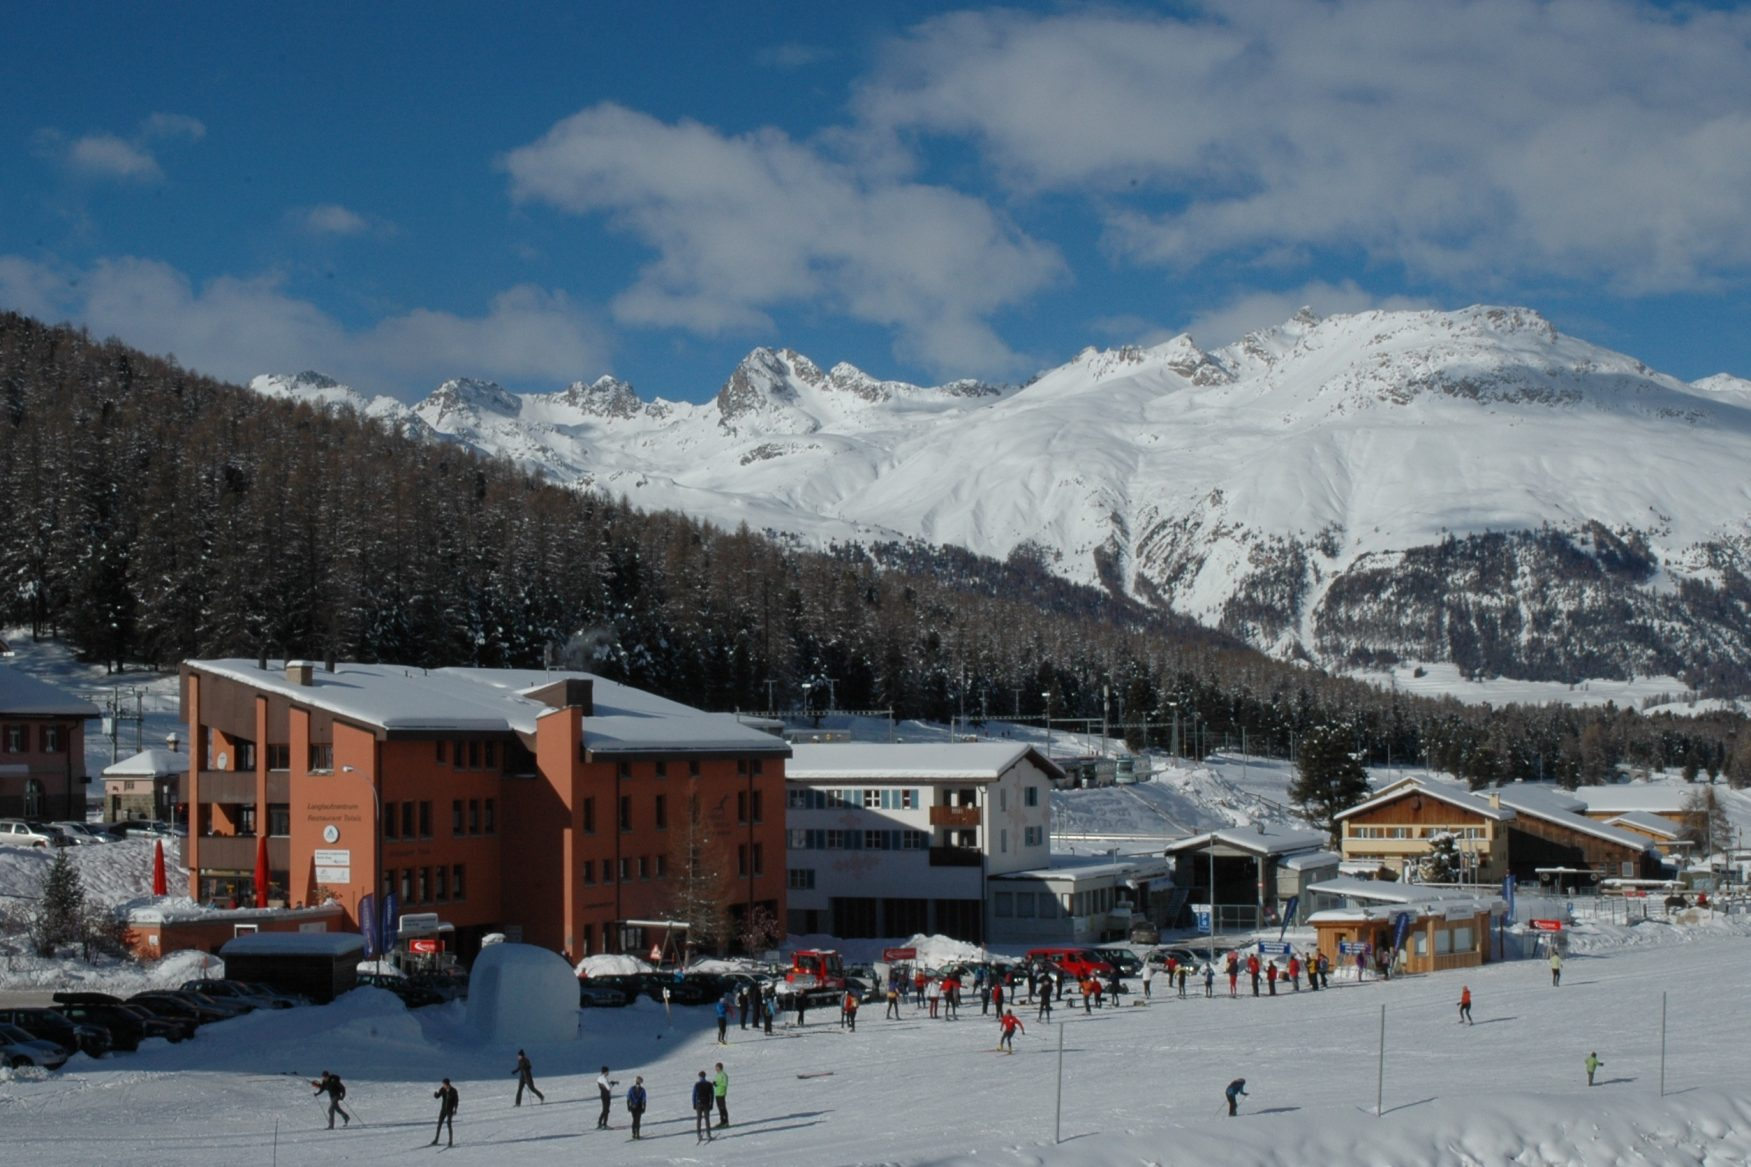 Blick vor beeindruckender Kulisse auf die Jugendherberge Pontresina im Winter, Foto: Jugendherberge Pontresina